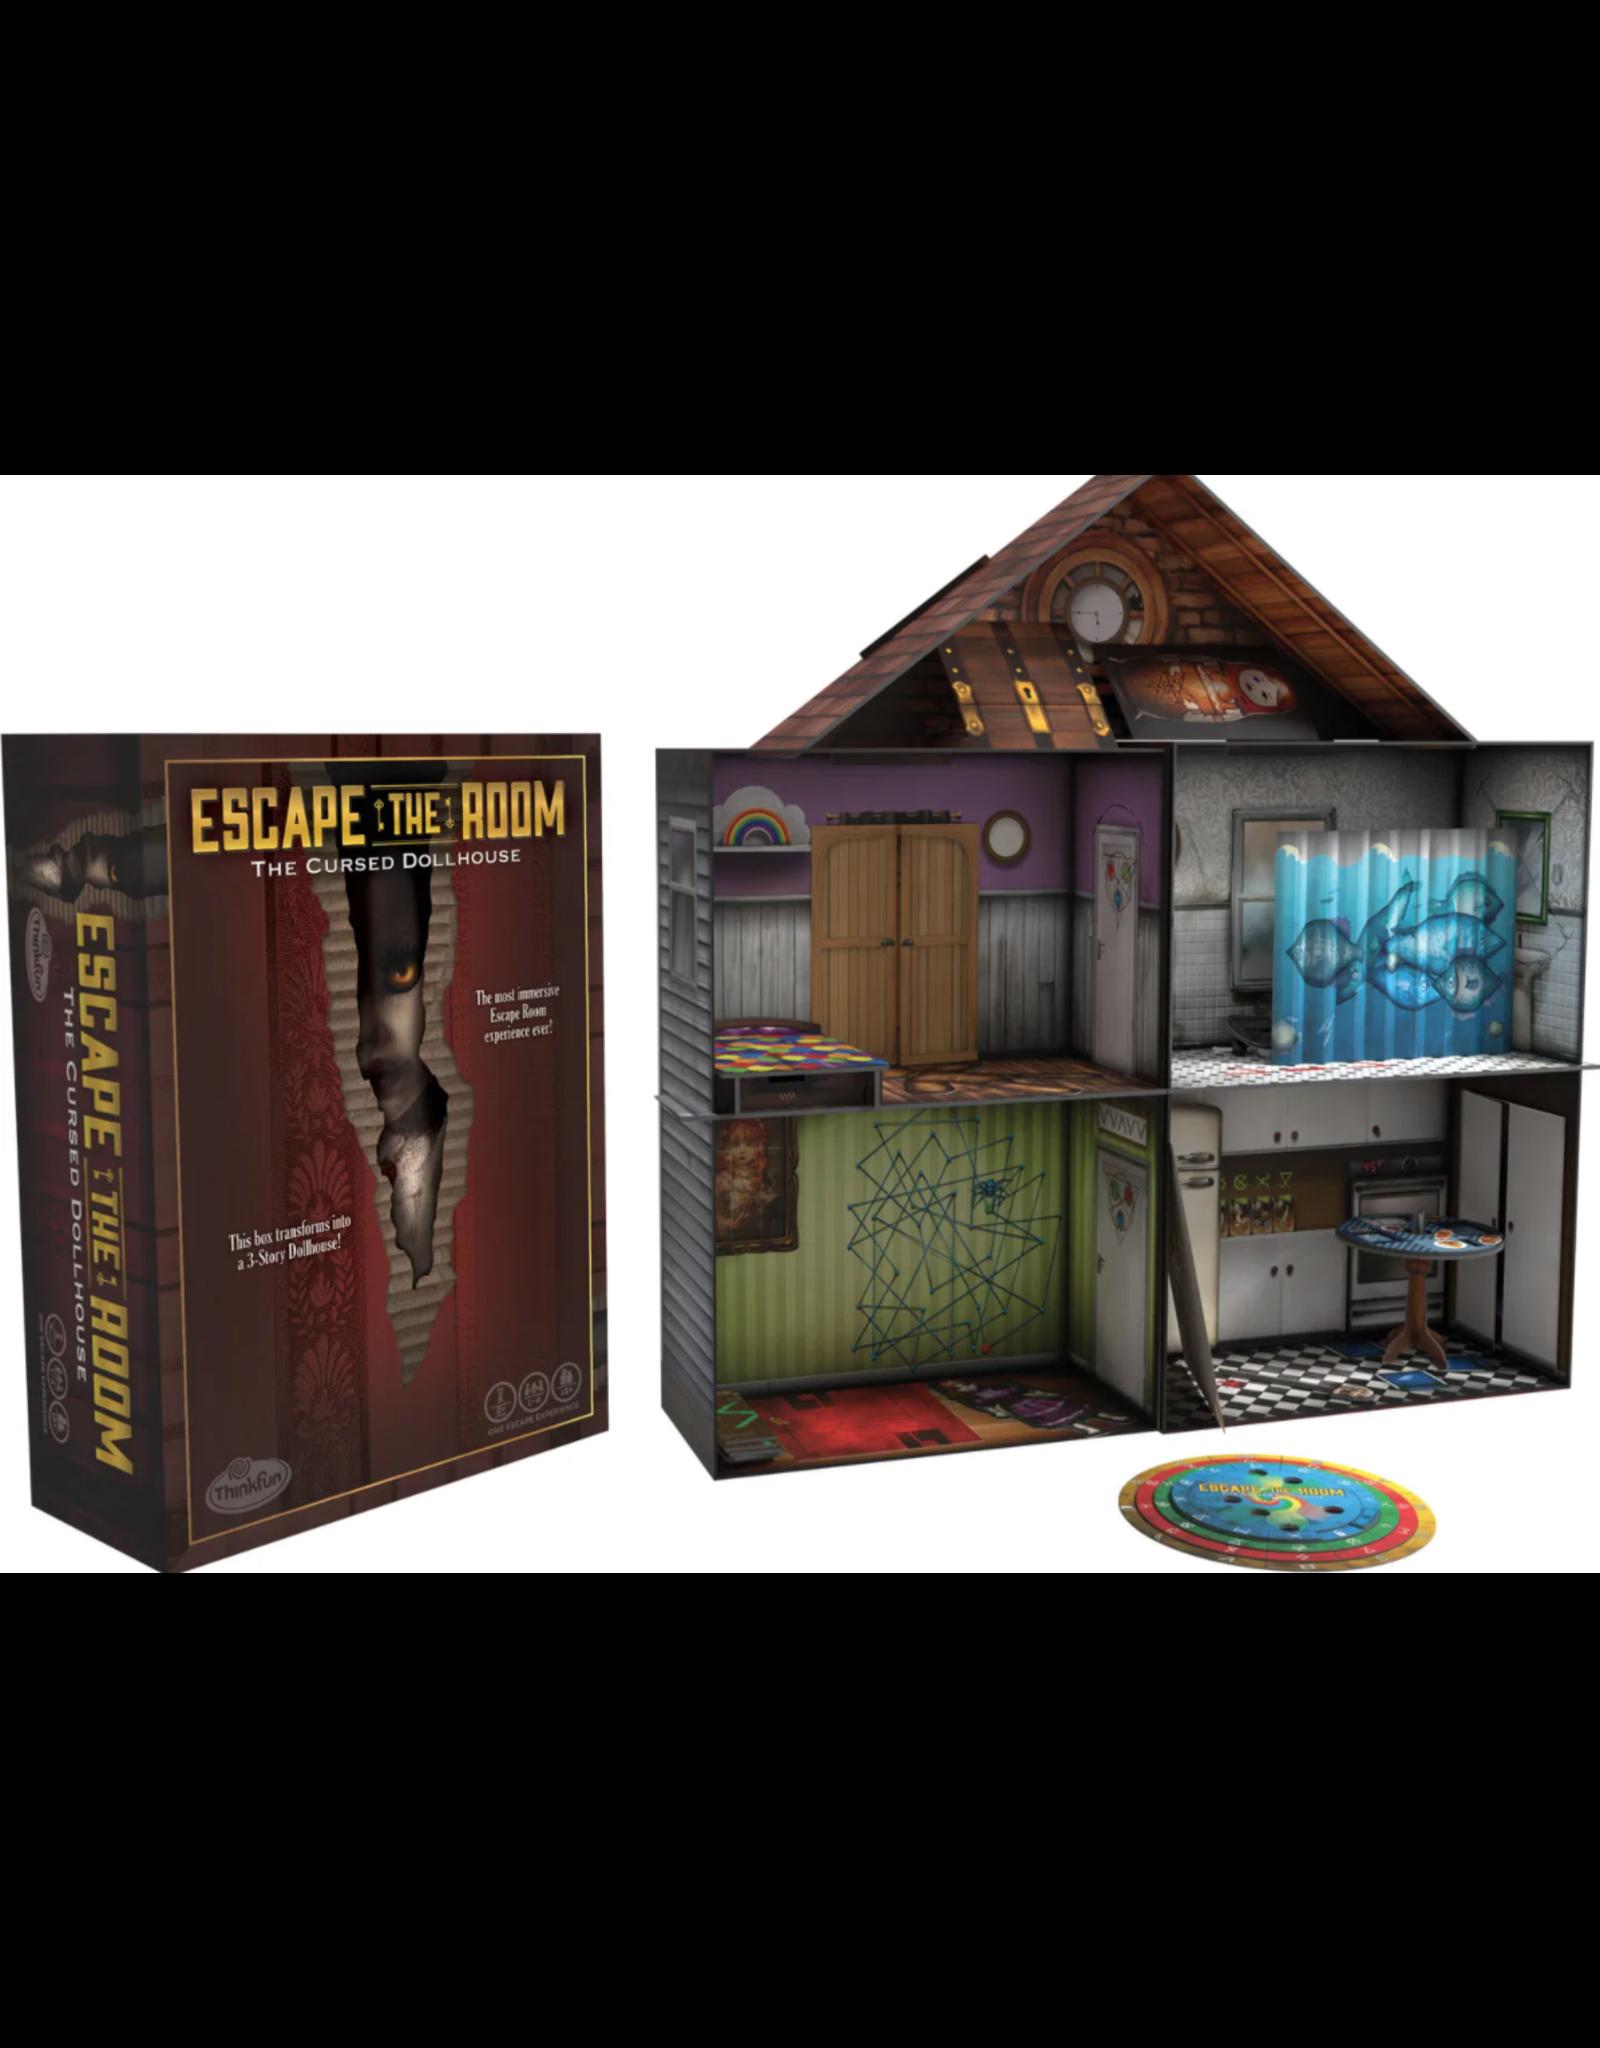 Think Fun Escape The Room - The Cursed Dollhouse